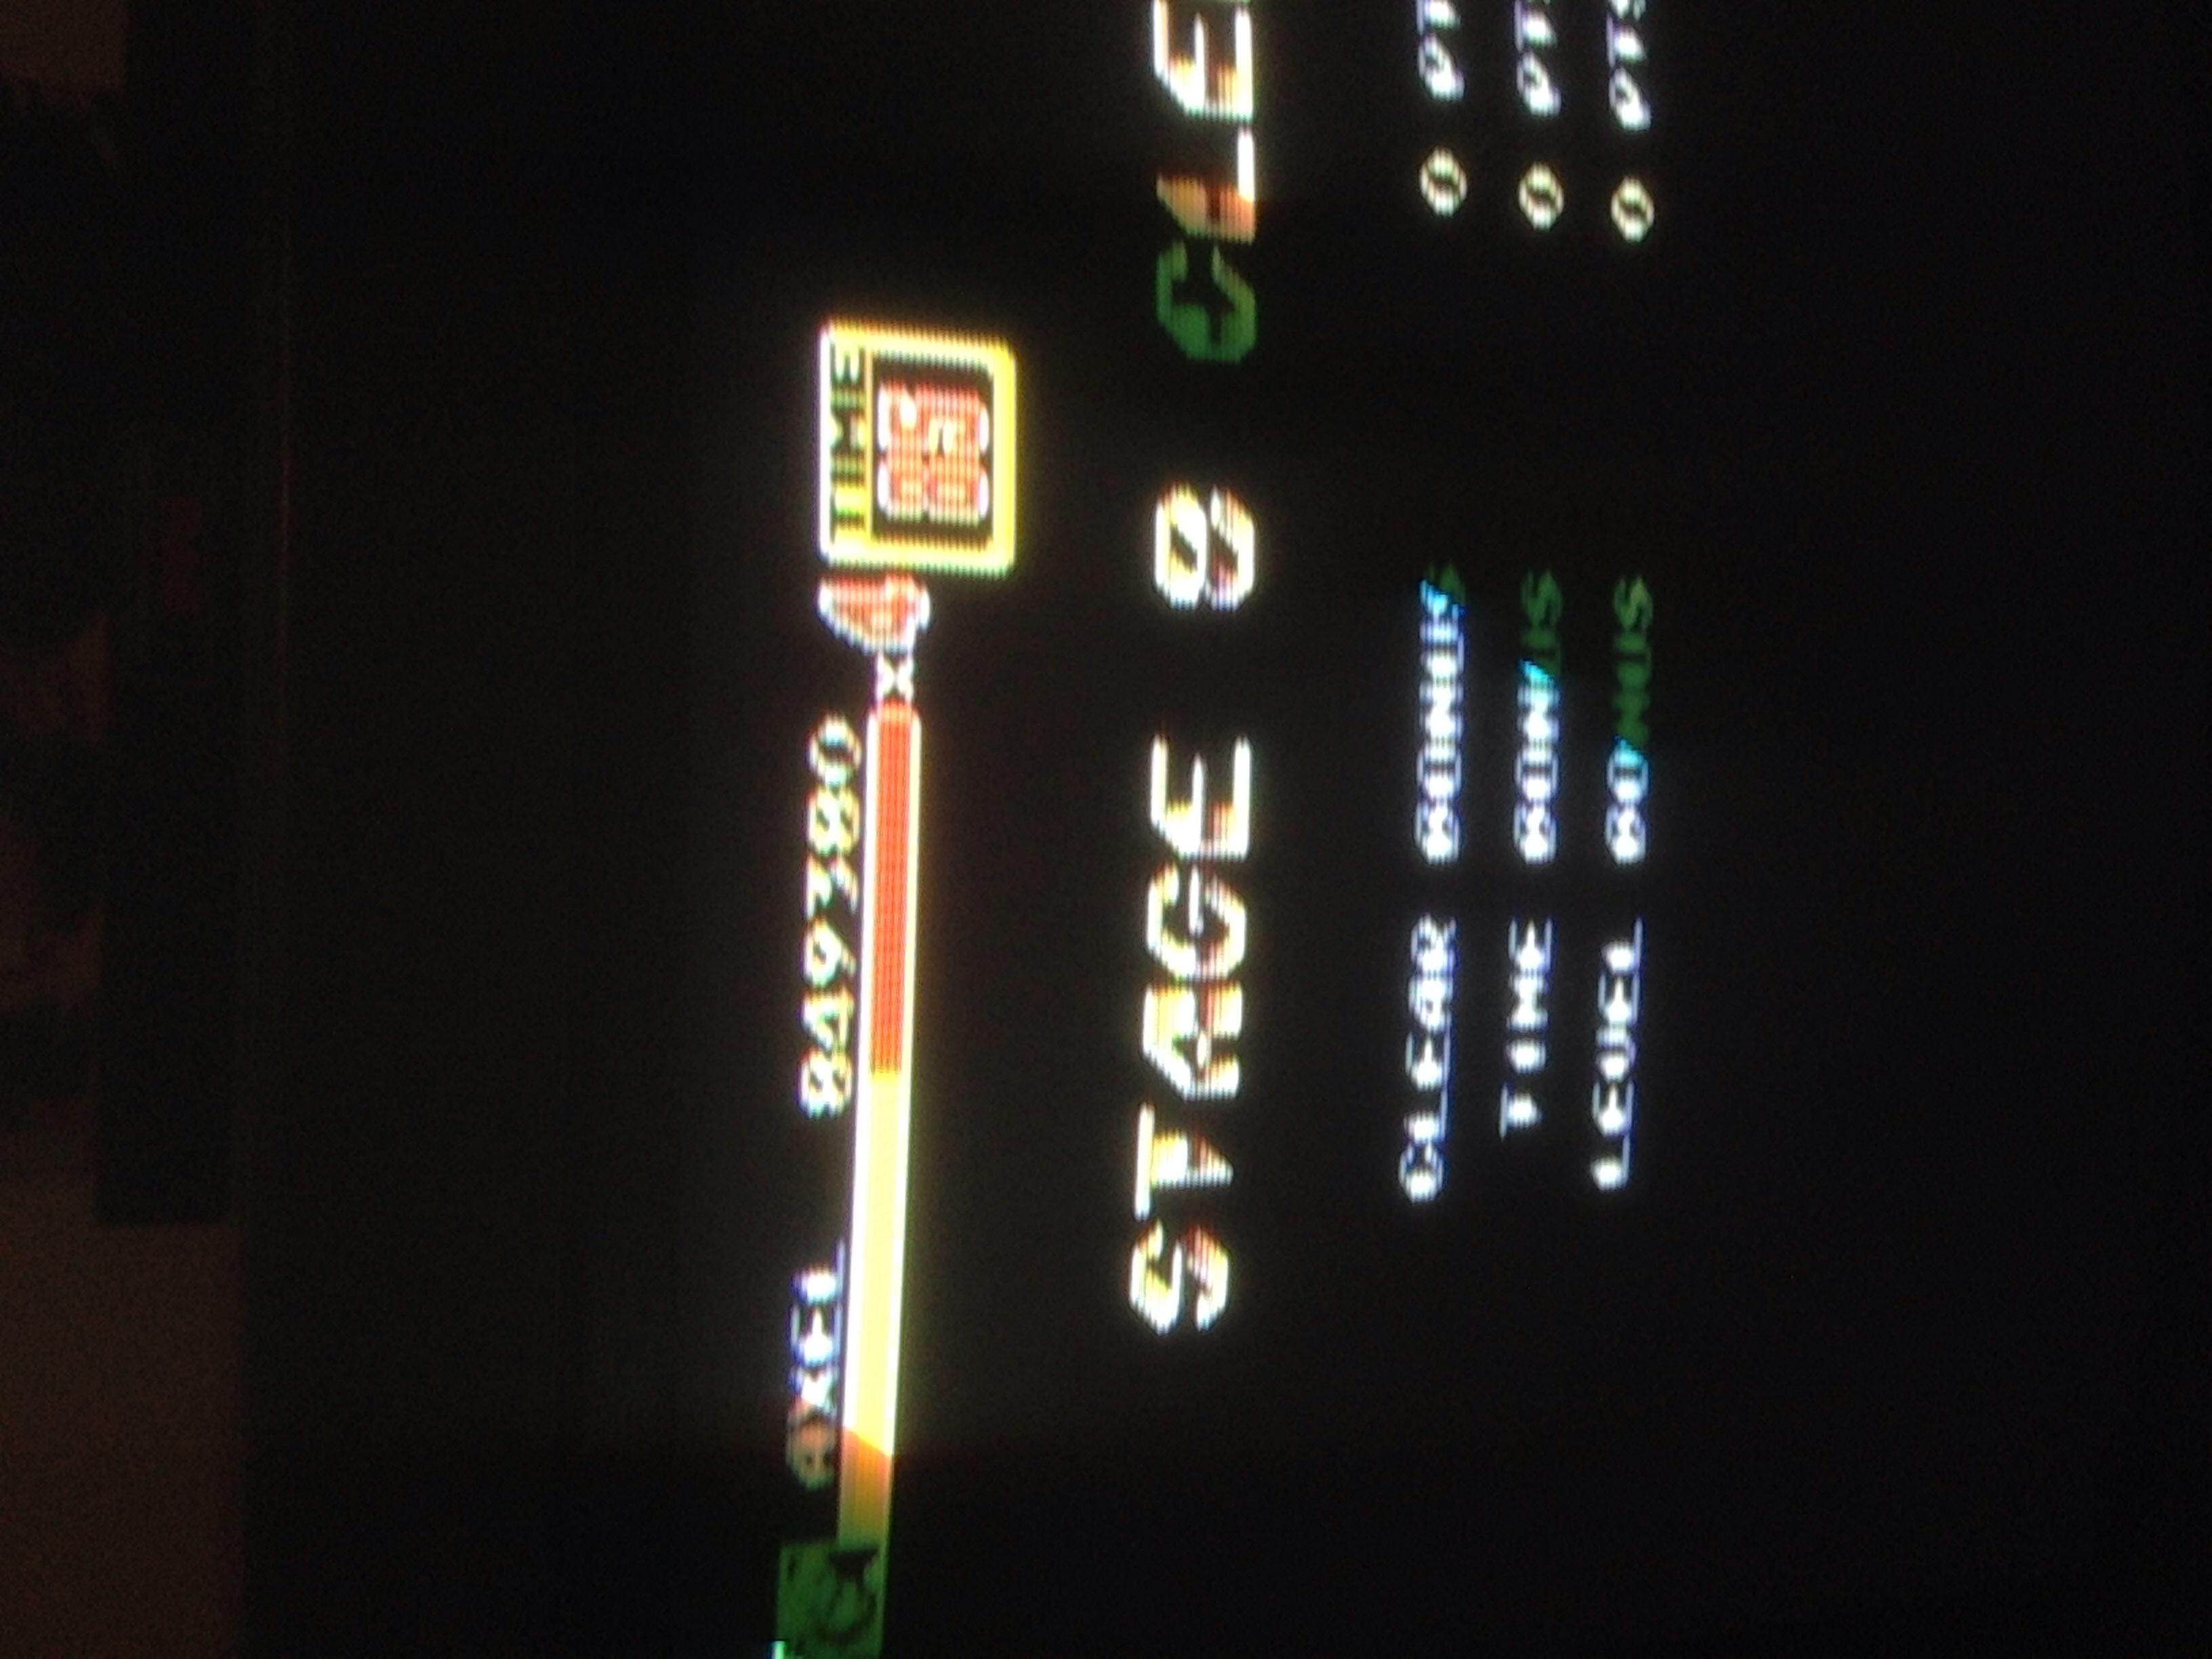 phillv85: Streets of Rage 2: Hard (Sega Genesis / MegaDrive) 849,380 points on 2015-05-18 13:45:53